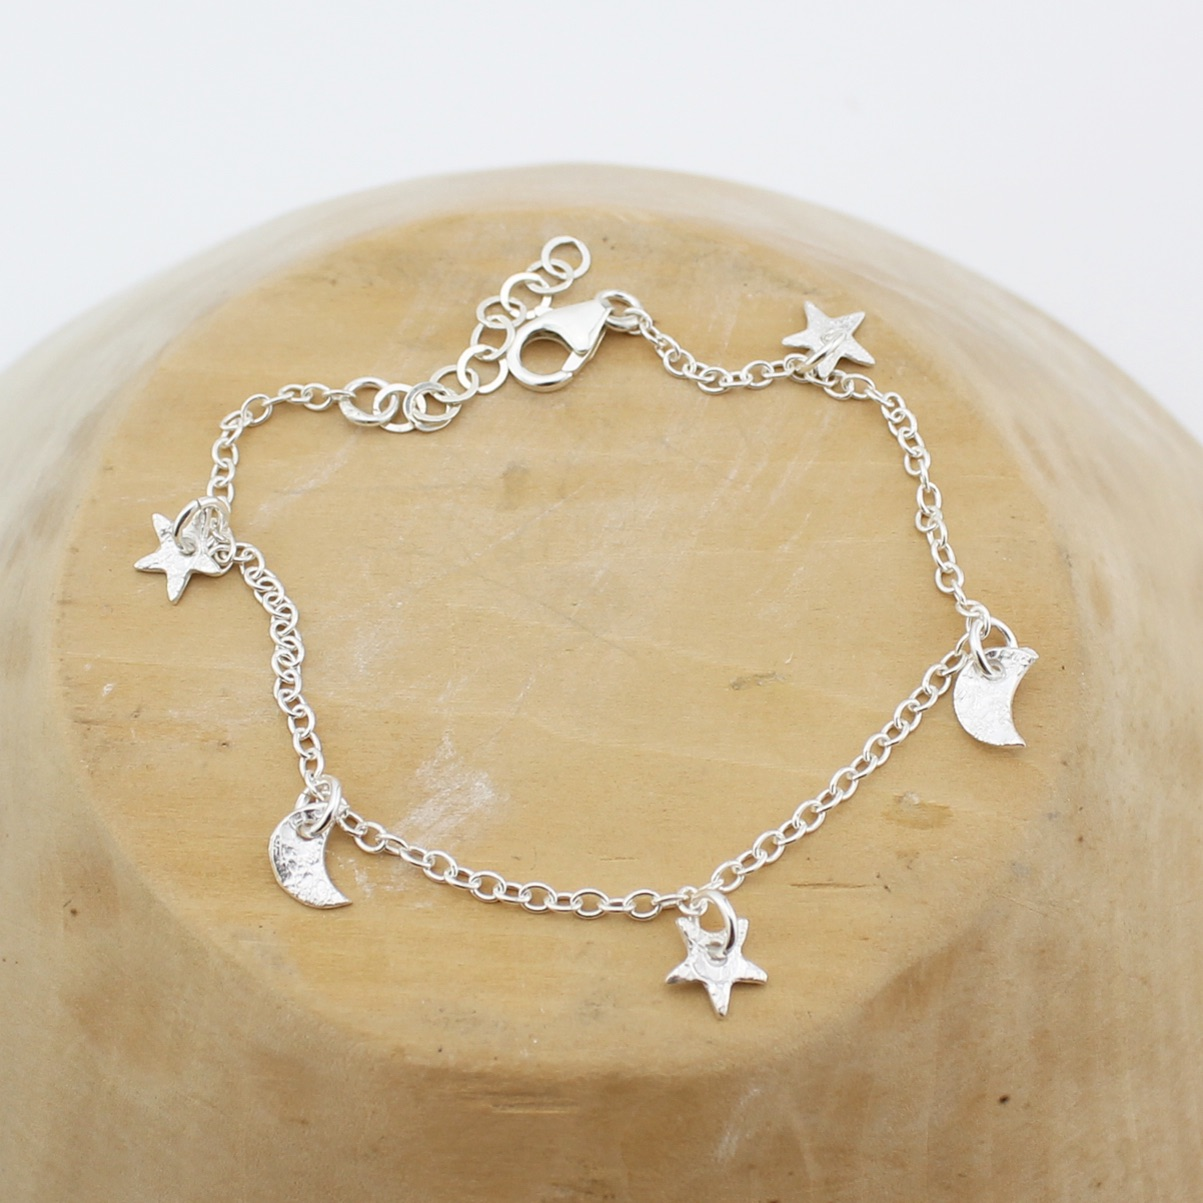 Silver Star & Moon Charm bracelet by Lucy Kemp